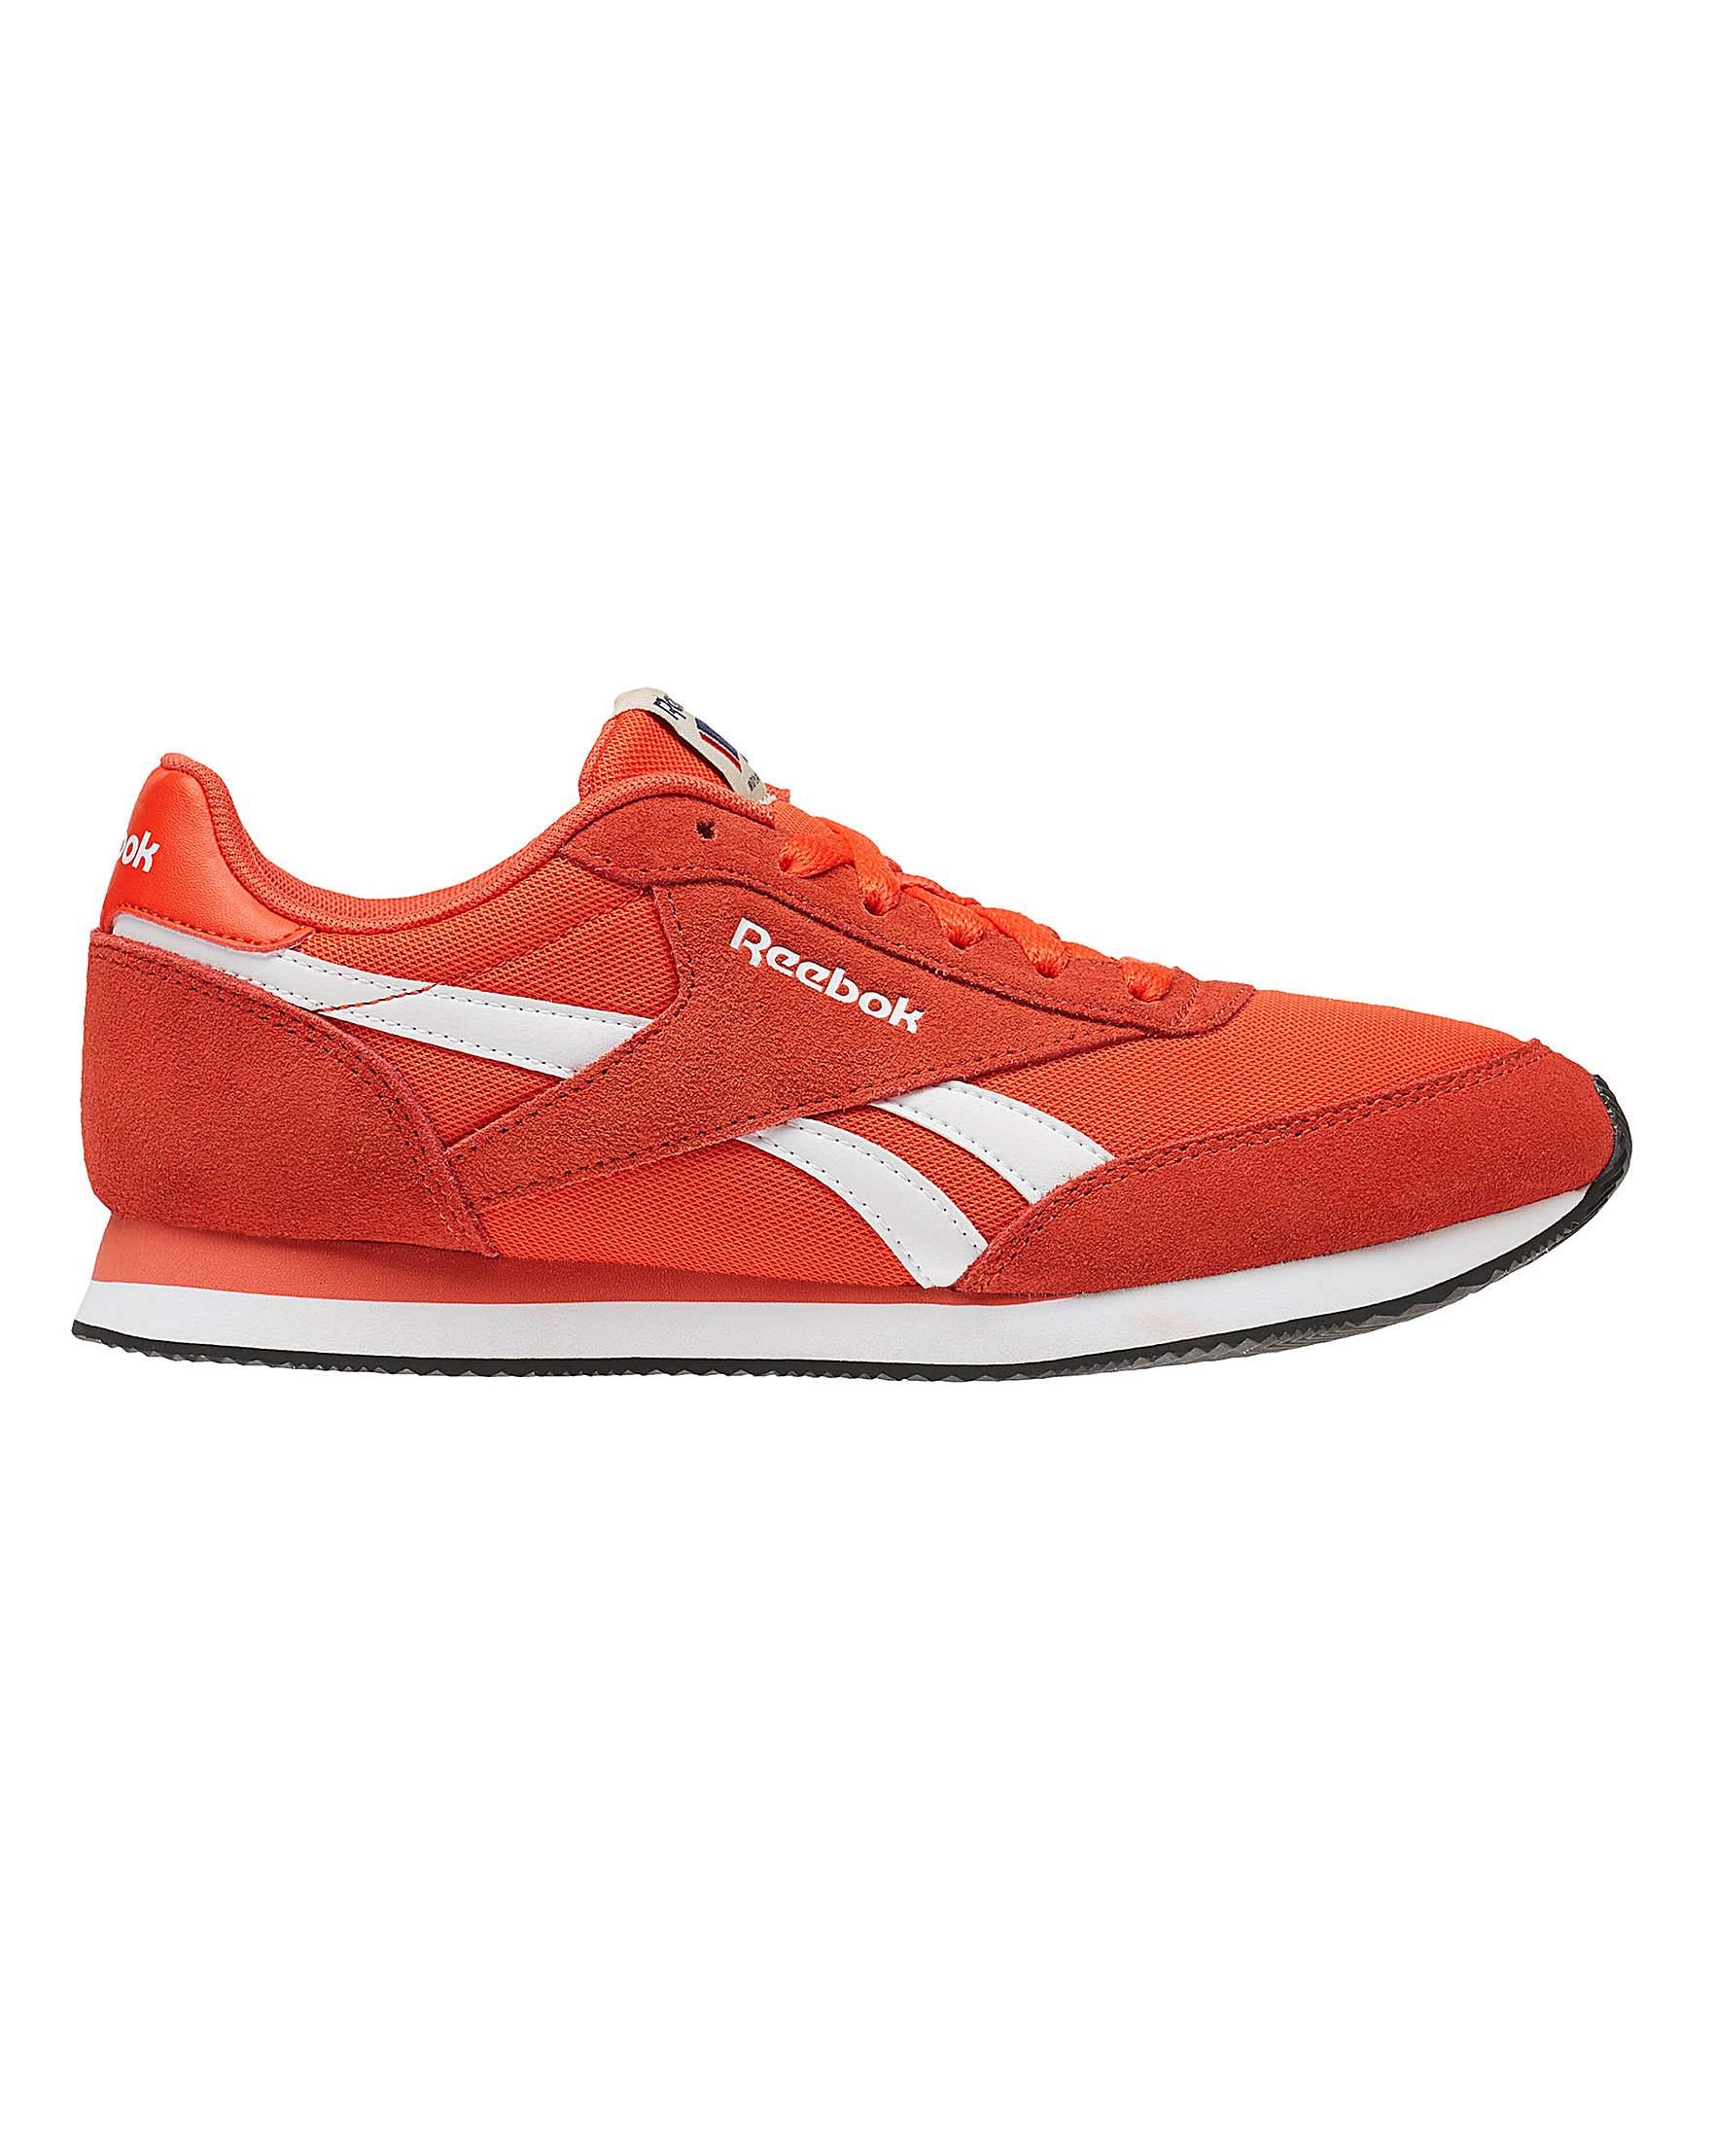 98411e6659d Reebok Royal CL Jog Trainers